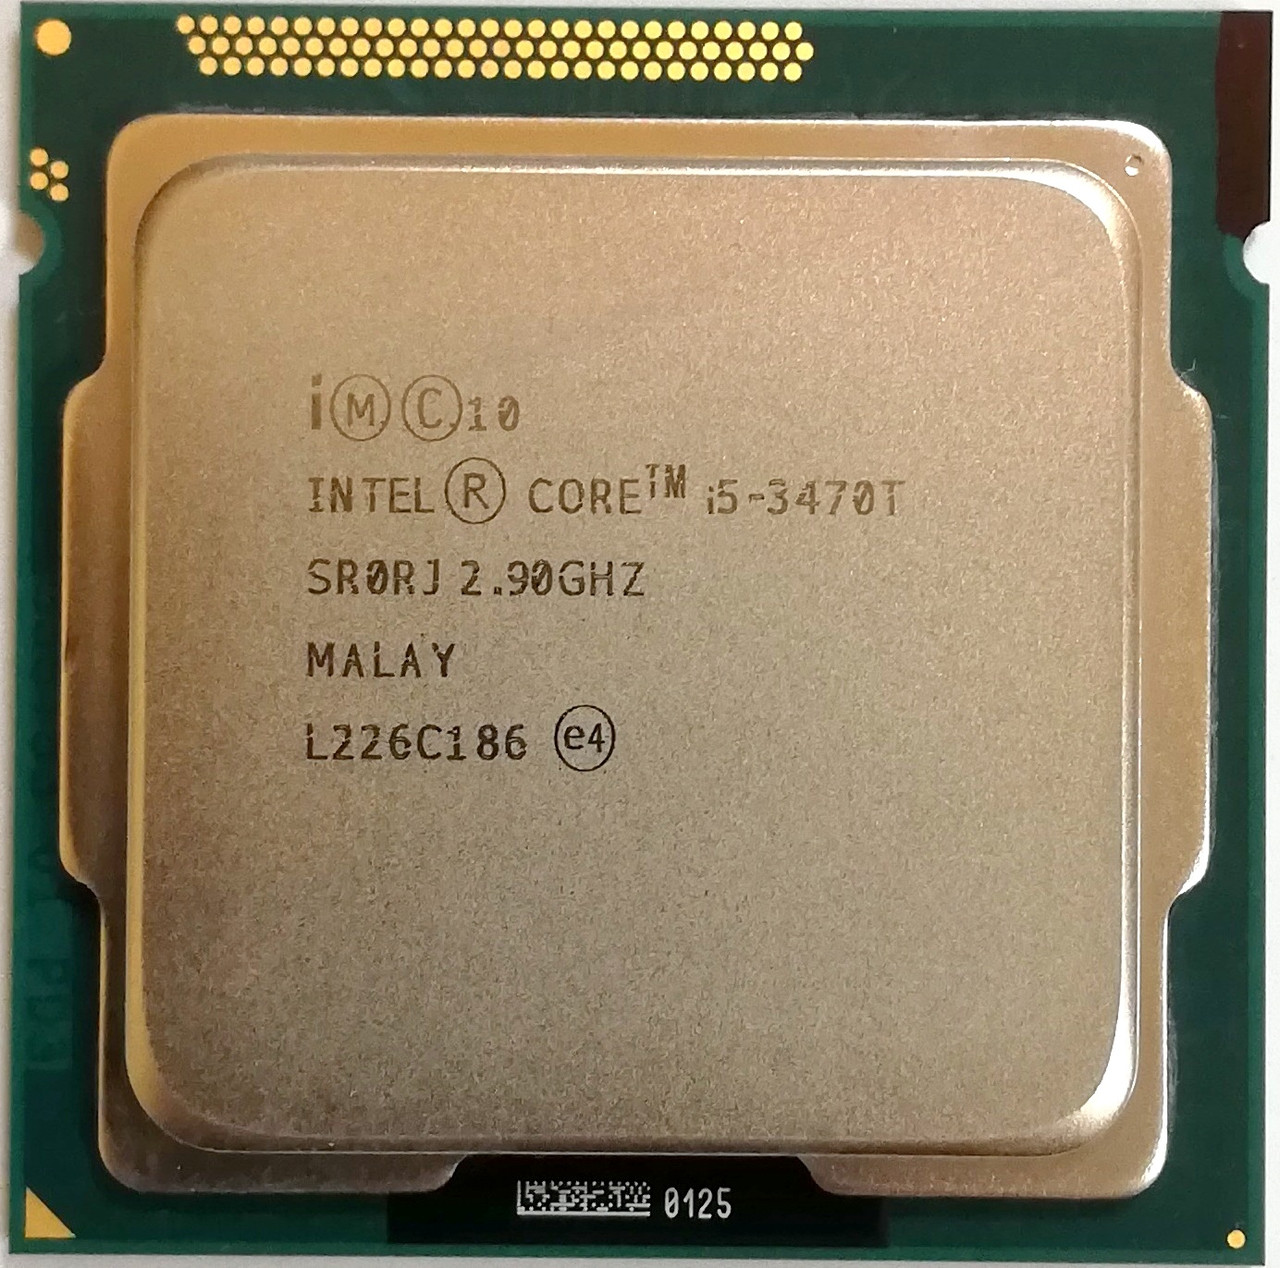 Процессор Intel Core i5-3470T L1 SR0RJ 2.9GHz up 3.6GHz 3M Cache Socket 1155 Б/У